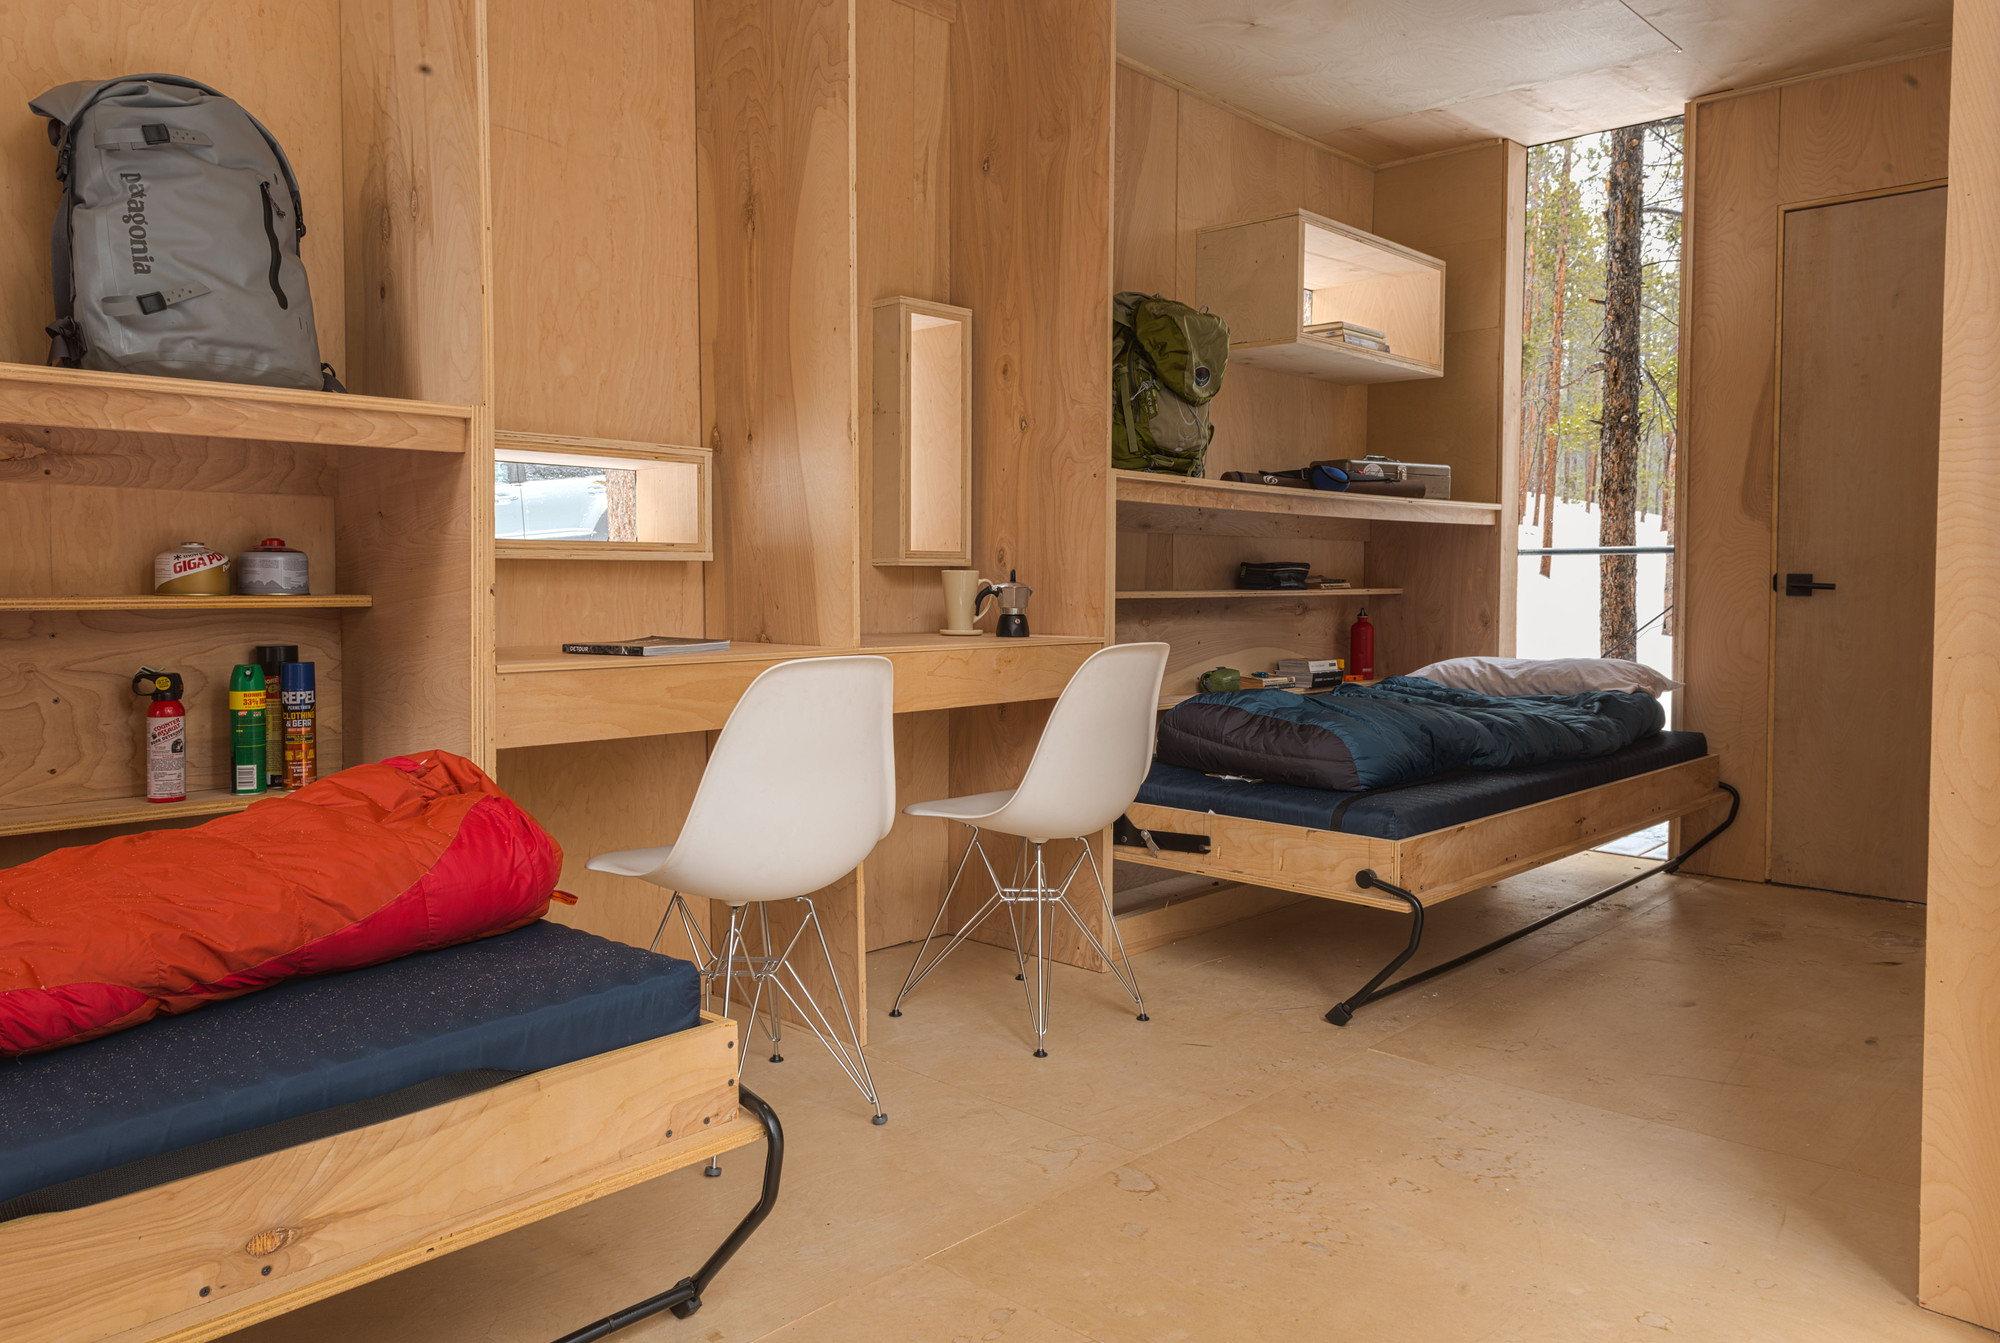 The Dormitory Of The Outward Bound School In Colorado